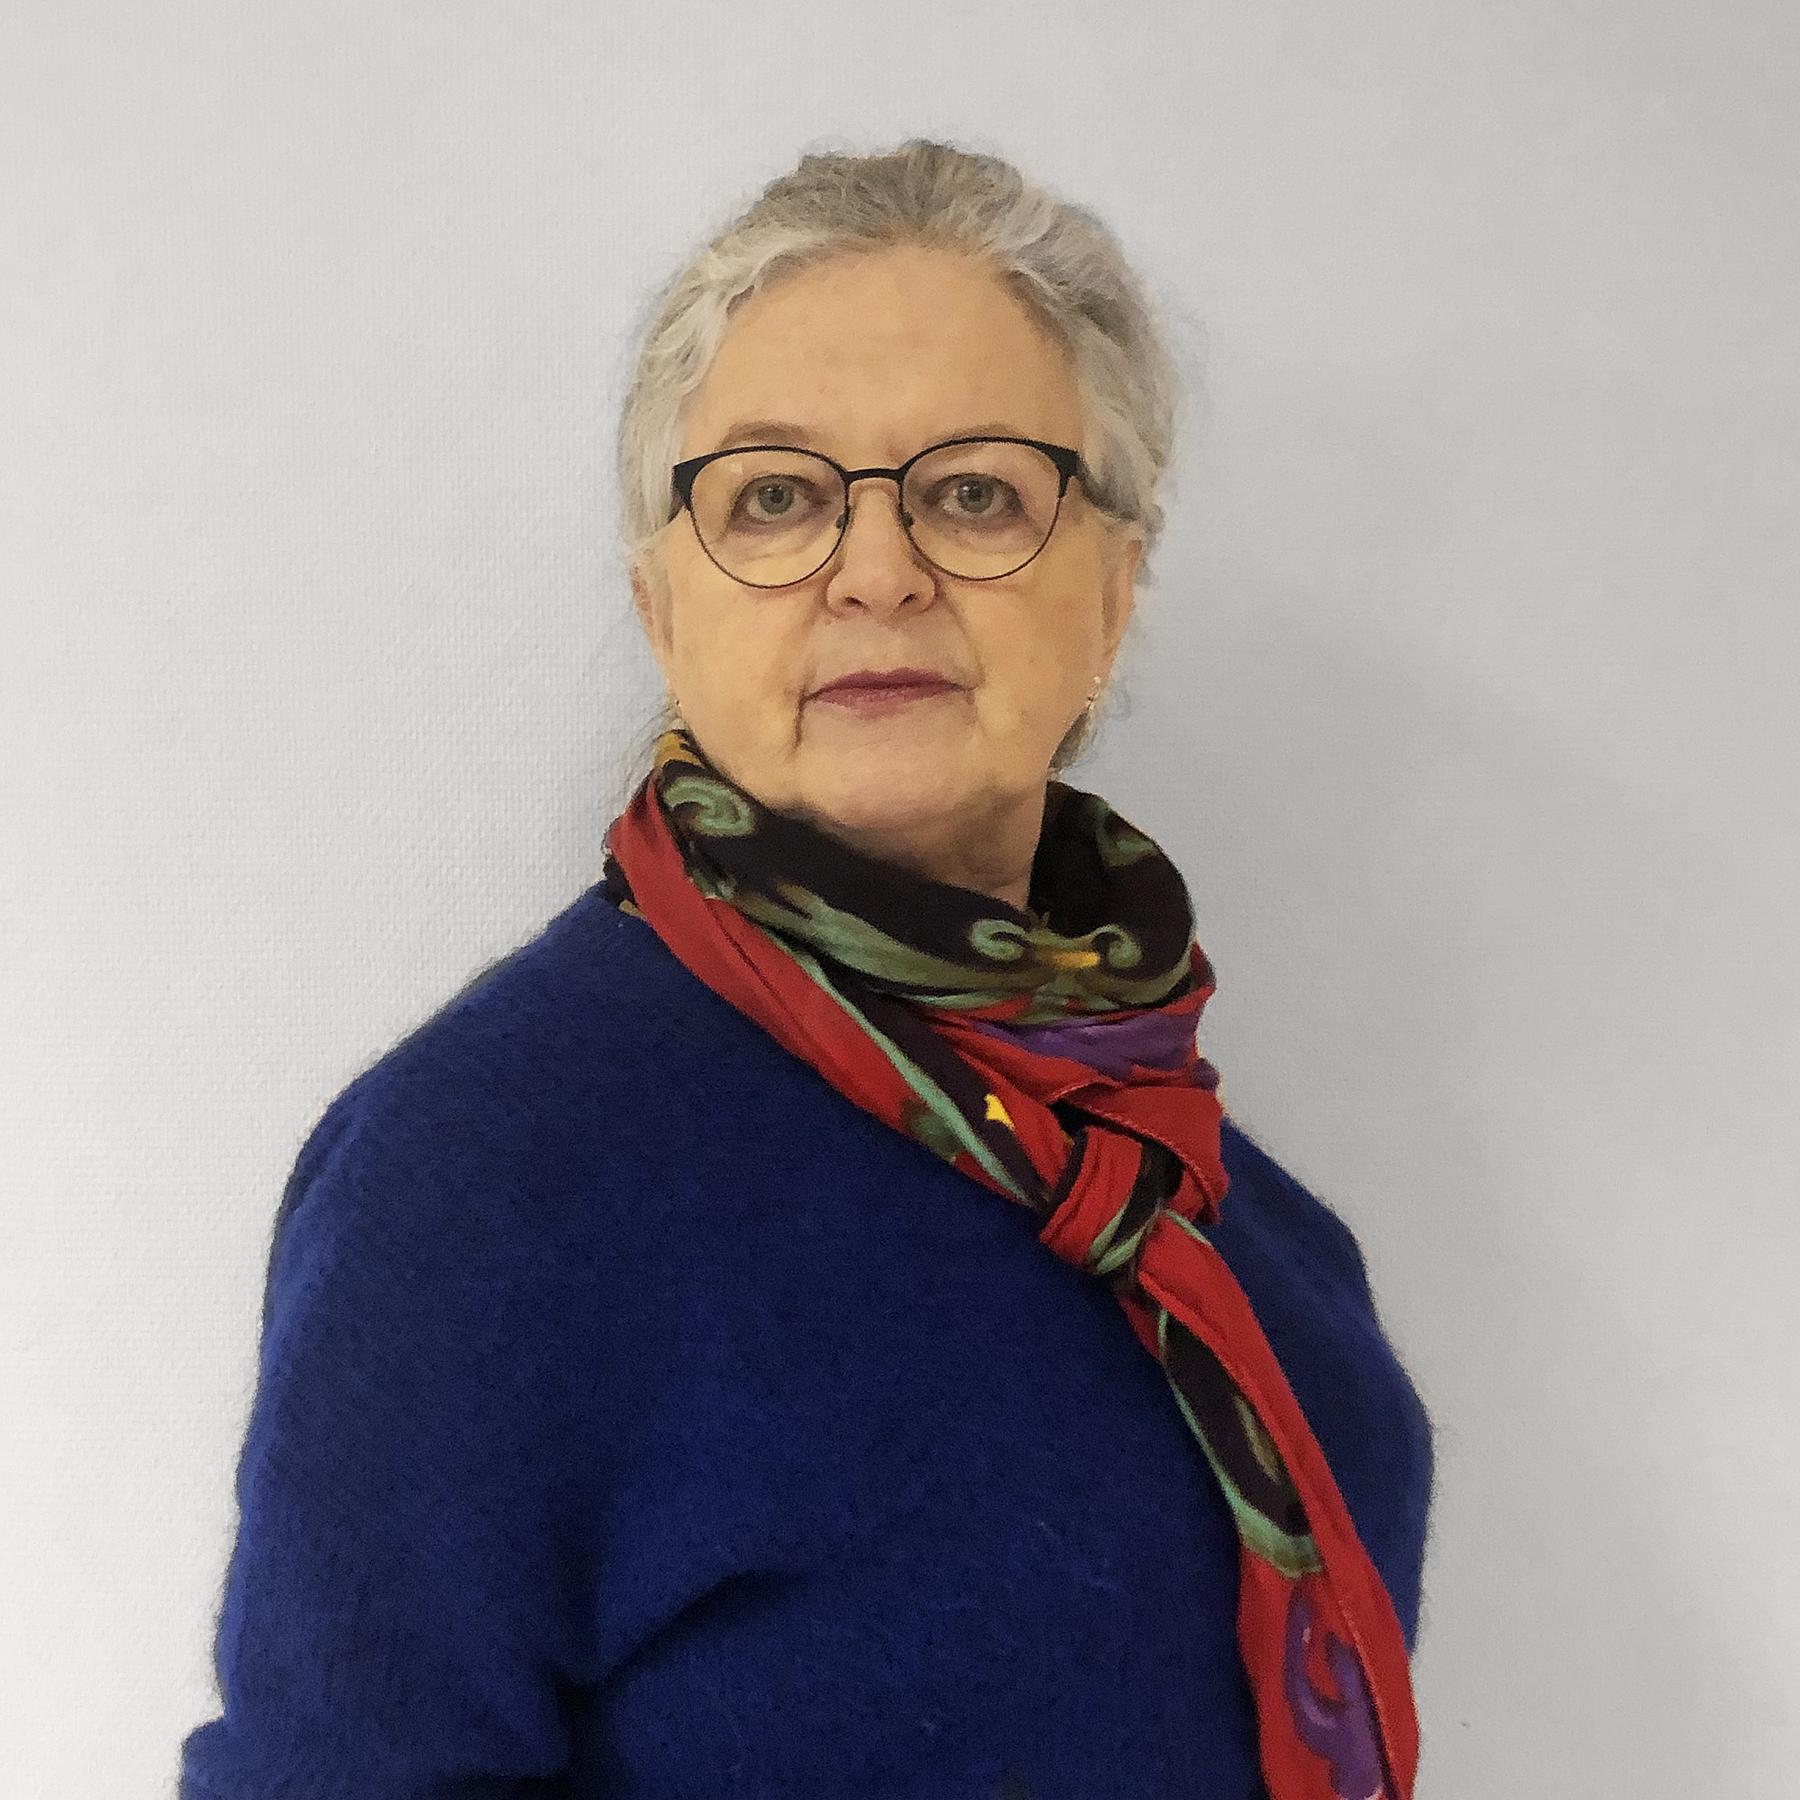 Annika Holgersson